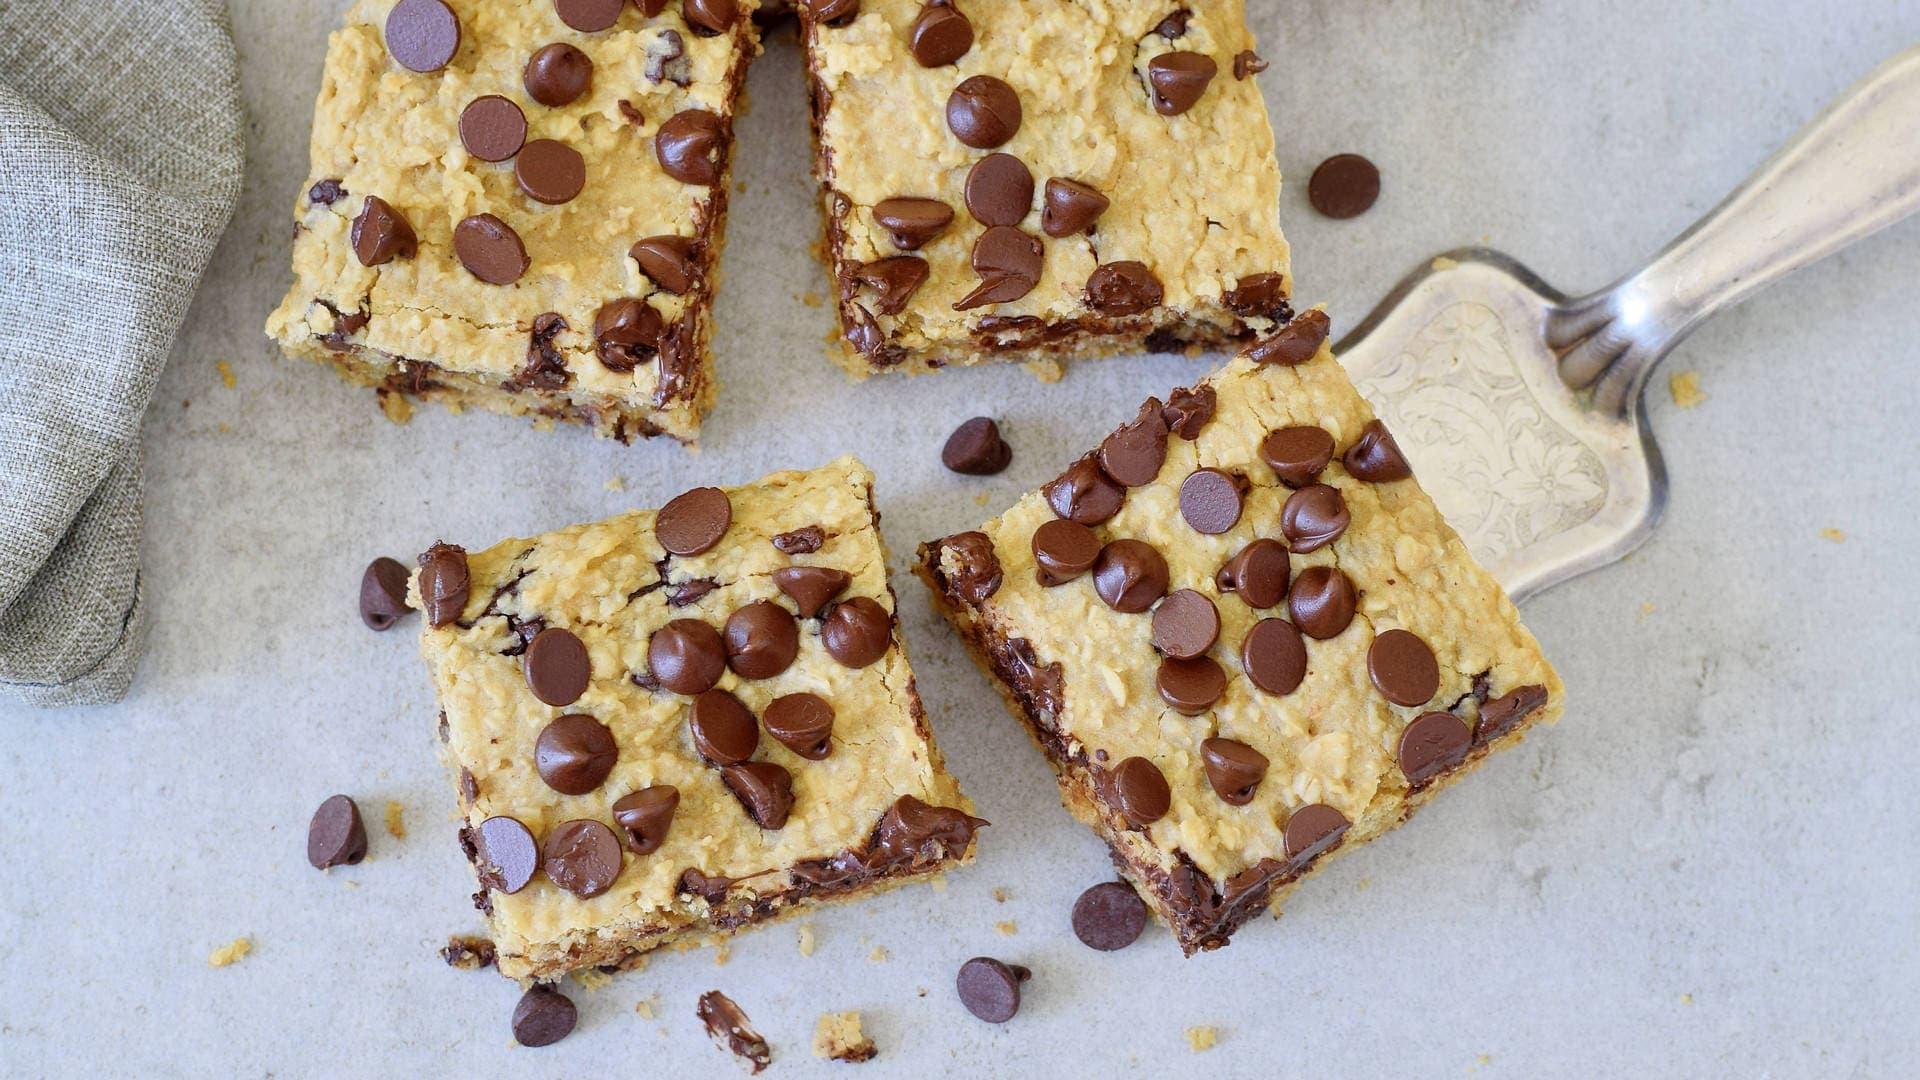 horizontal shot of 4 vegan oatmeal chocolate chip bars